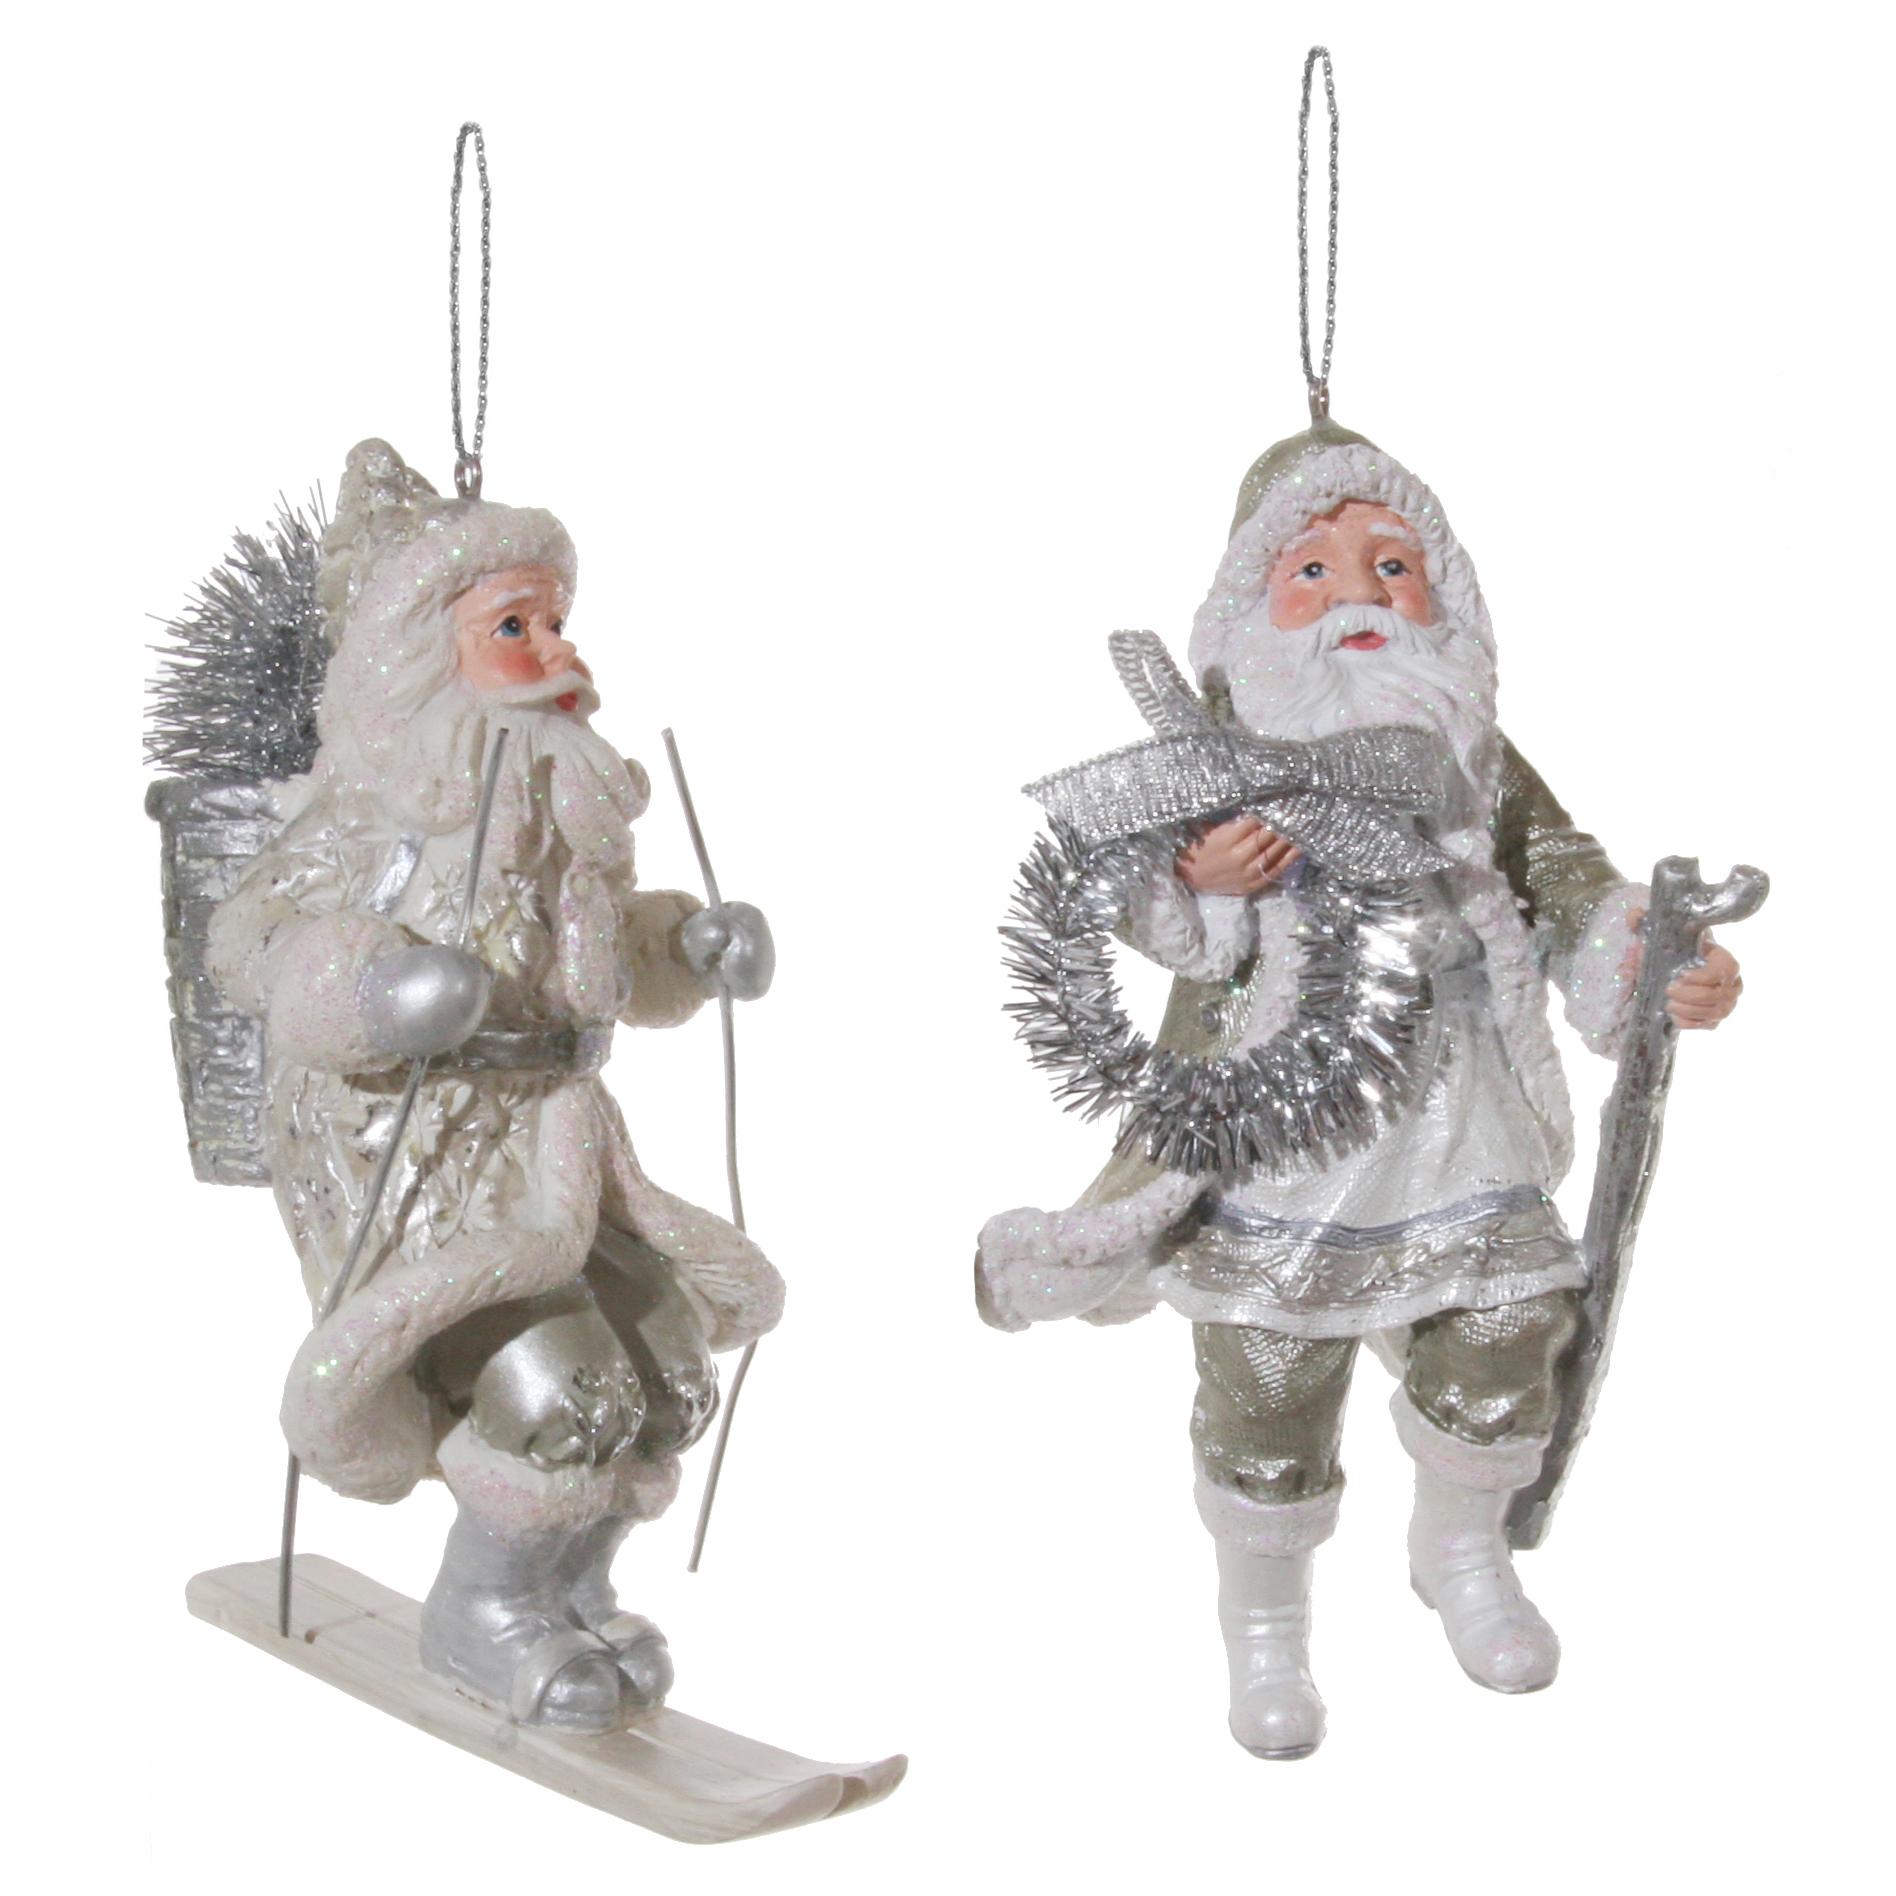 Tomte i silver